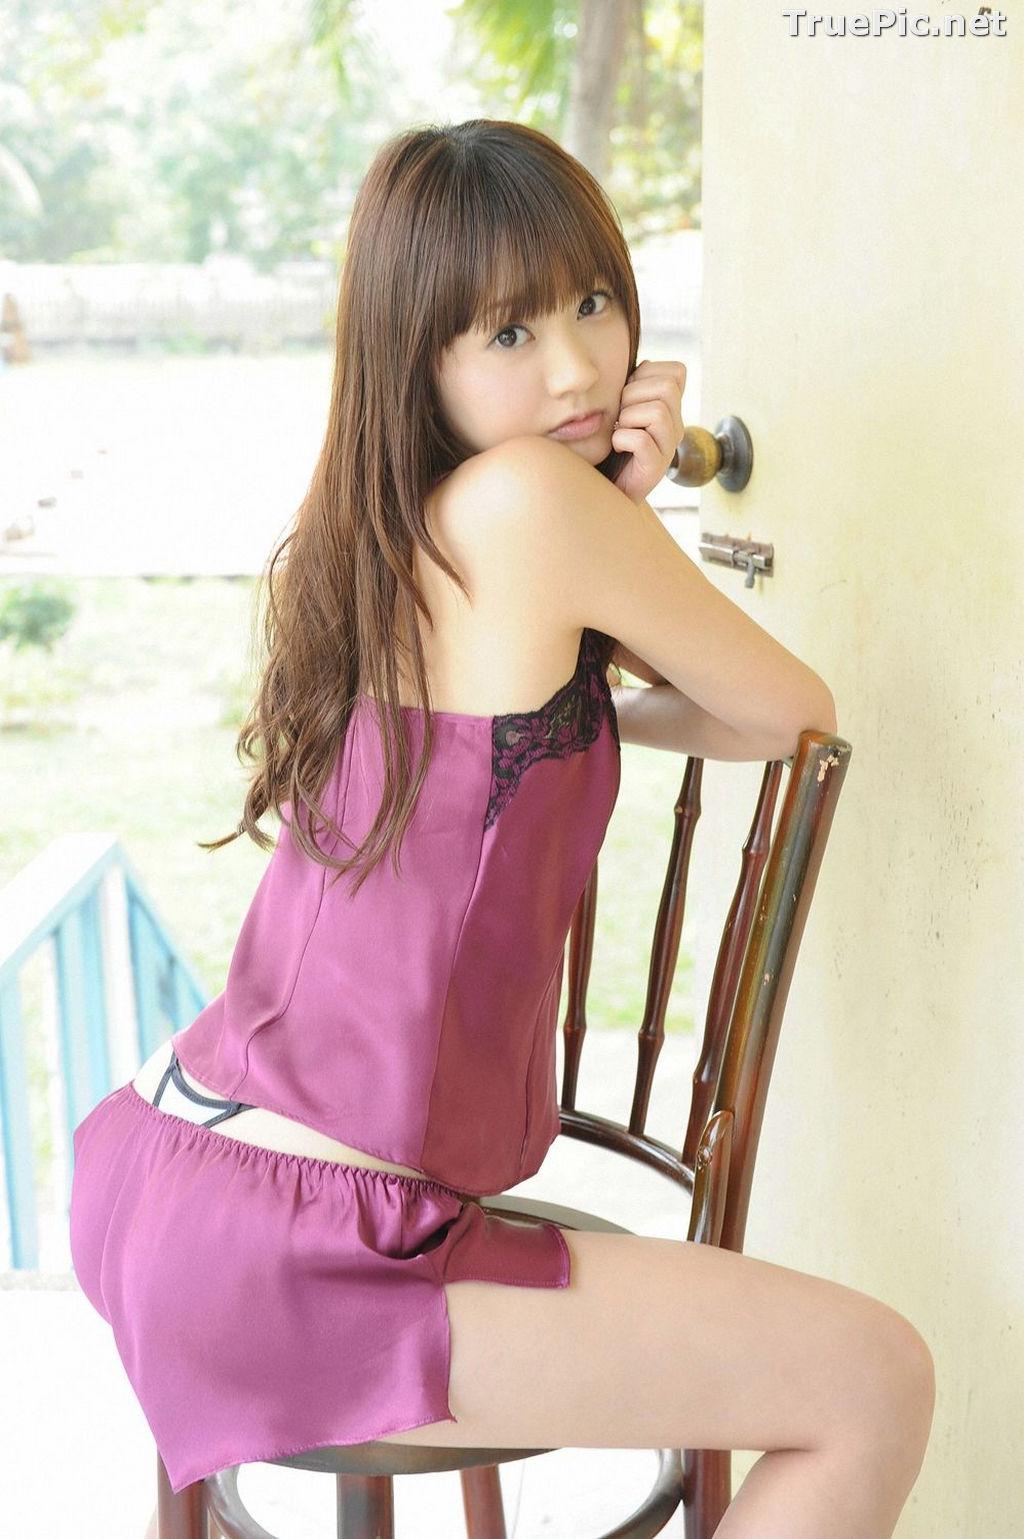 Image [YS Web] Vol.403 - Japanese Tarento and Gravure Idol - Hamada Shoko - TruePic.net - Picture-2